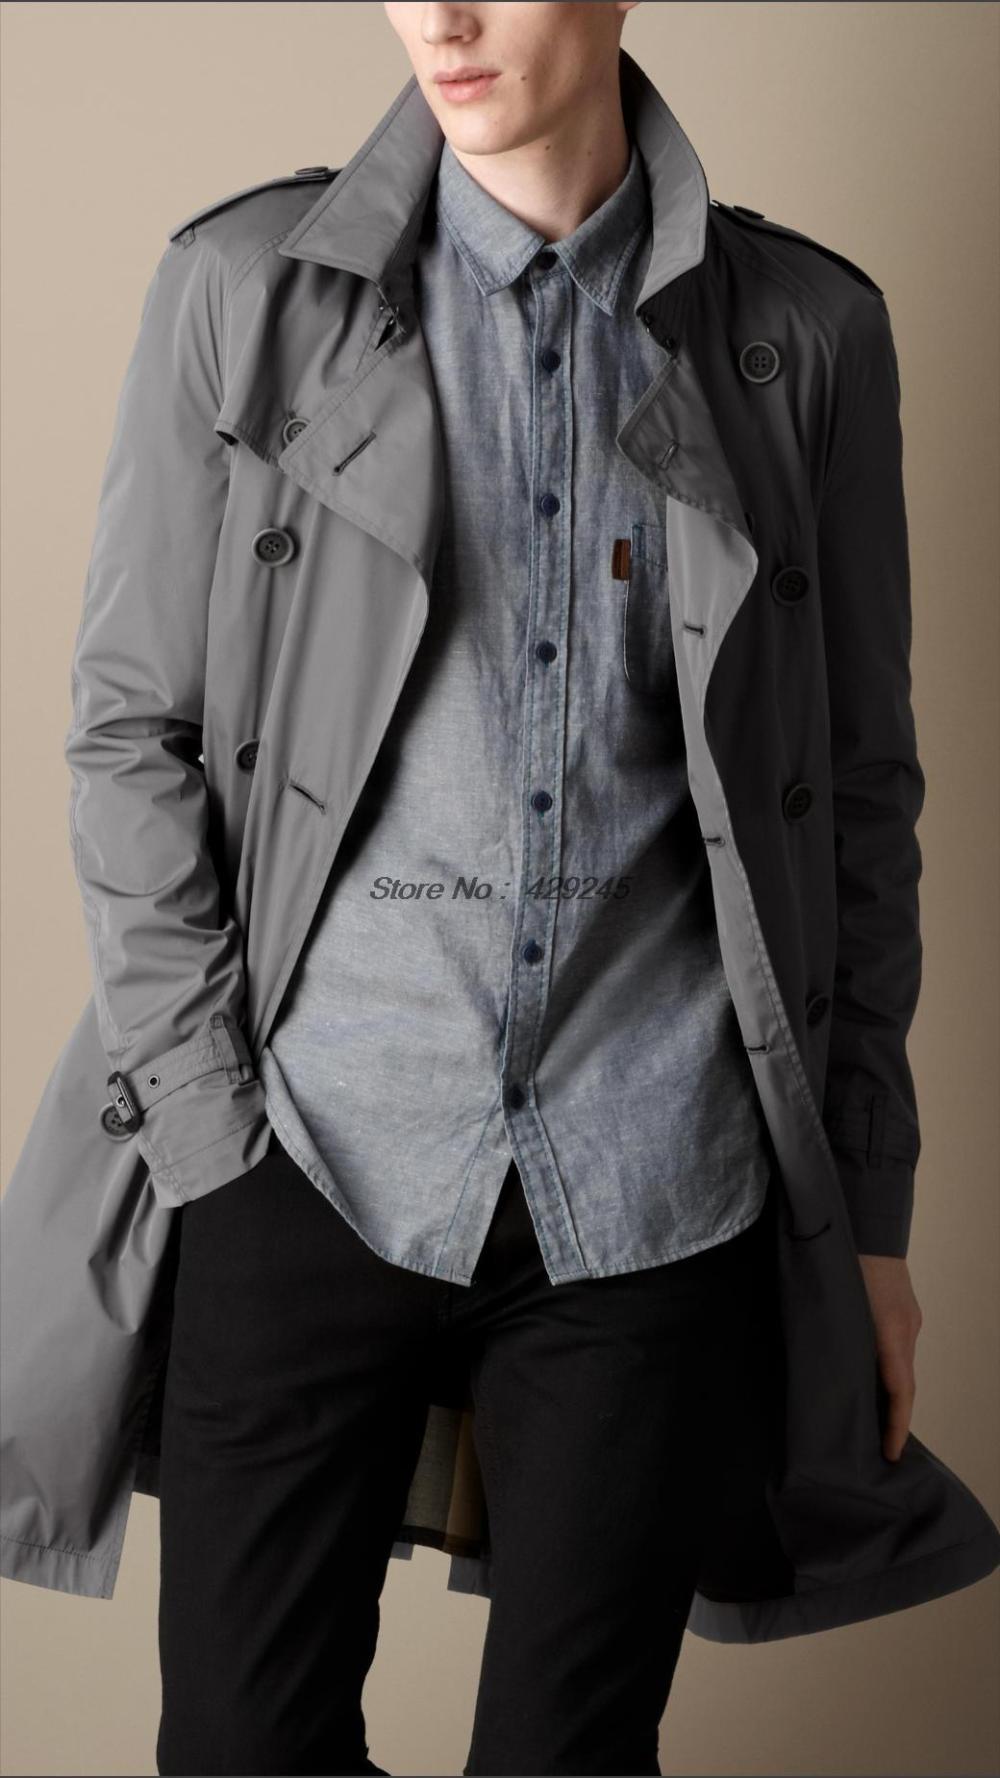 2013 Fashion Trench Coat mid length raglan sleeve 100%